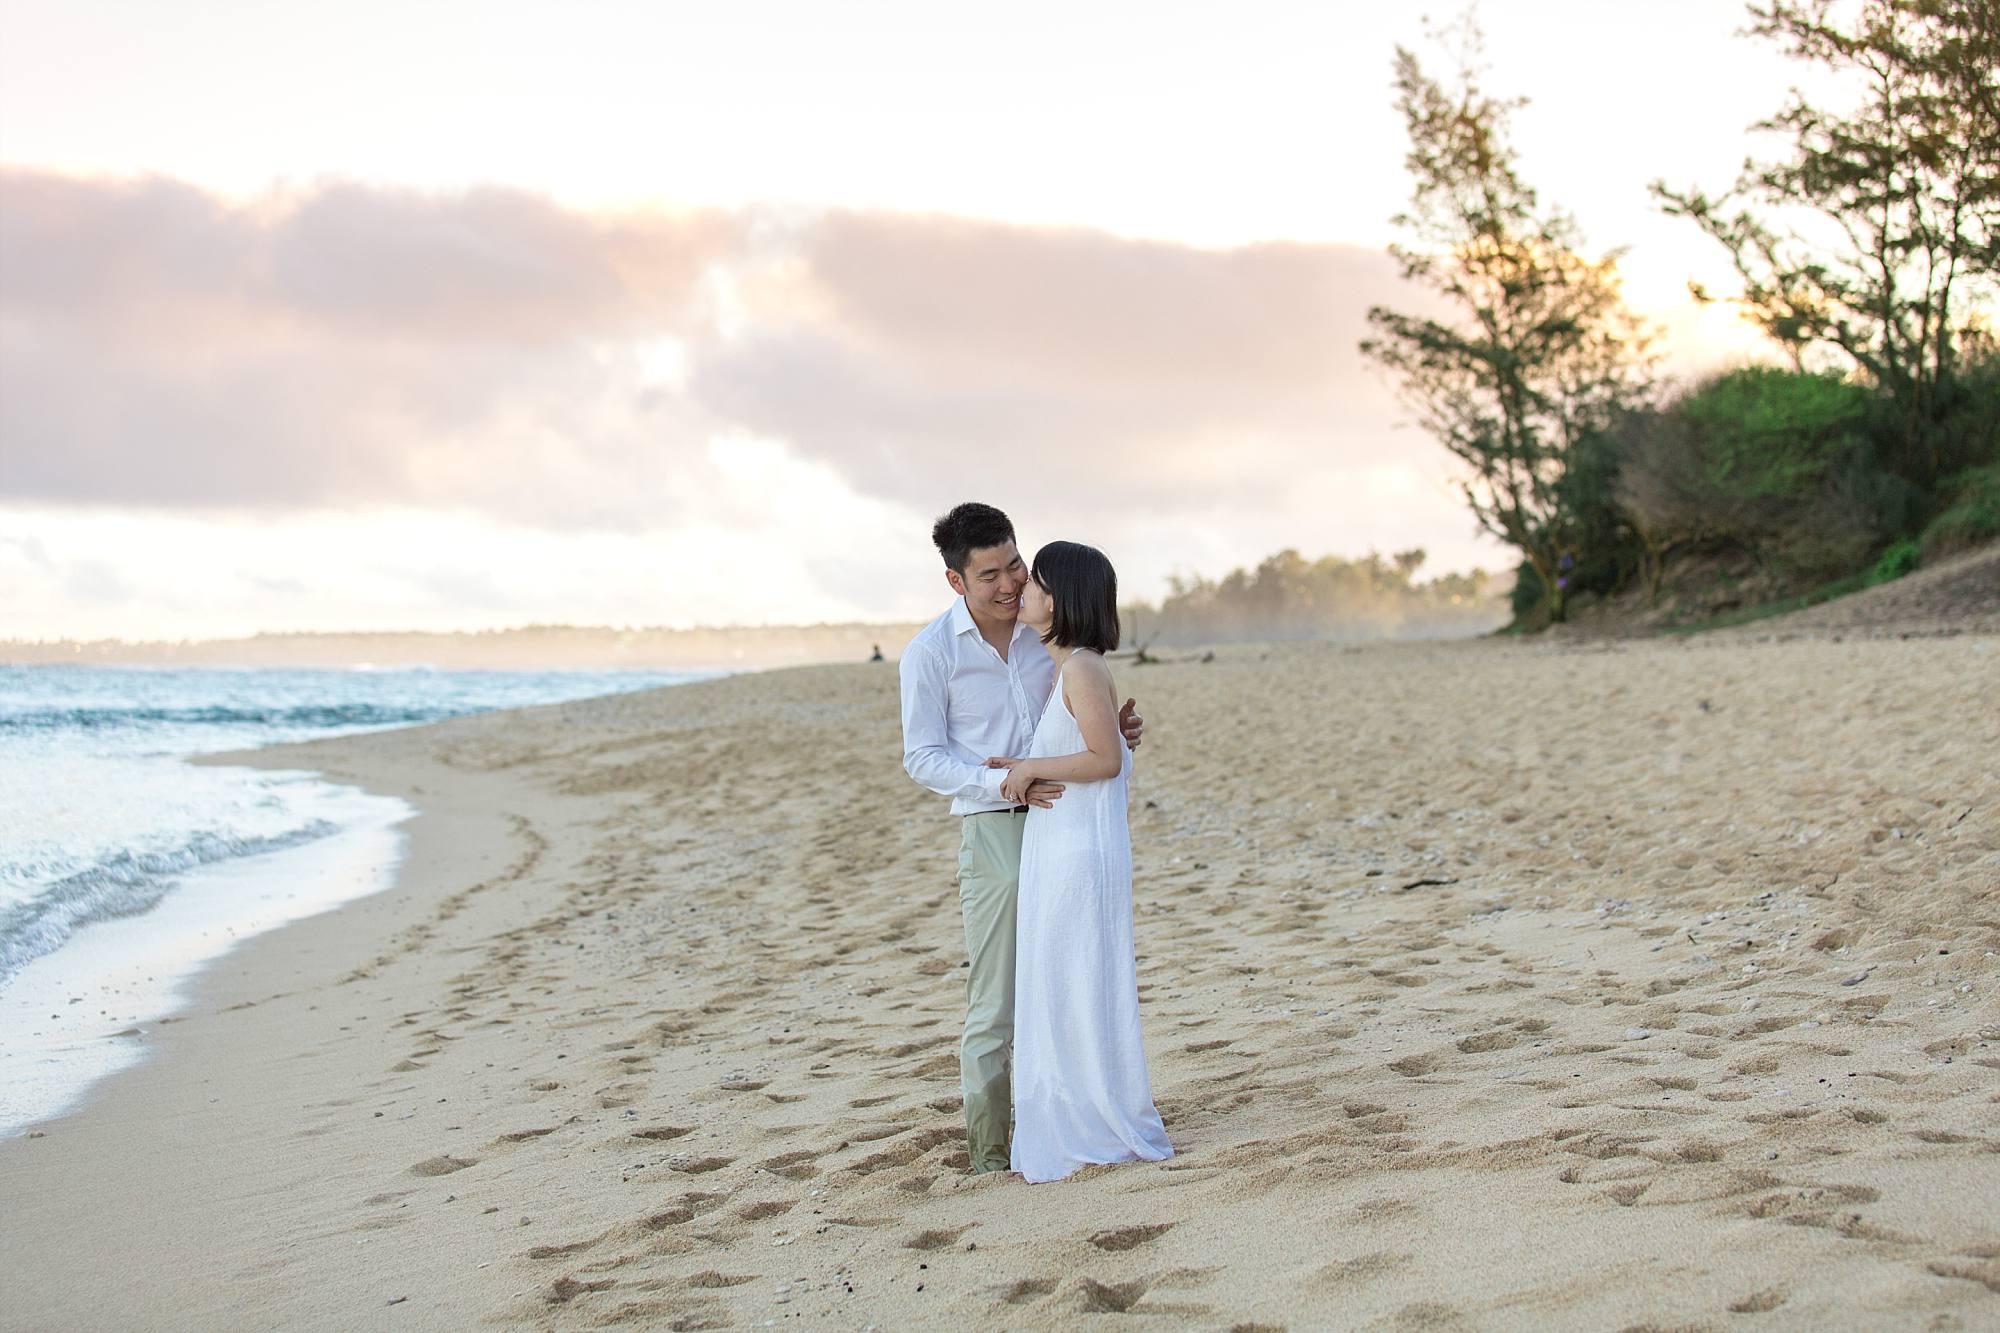 couple overlooking ocean, cuddling on beach